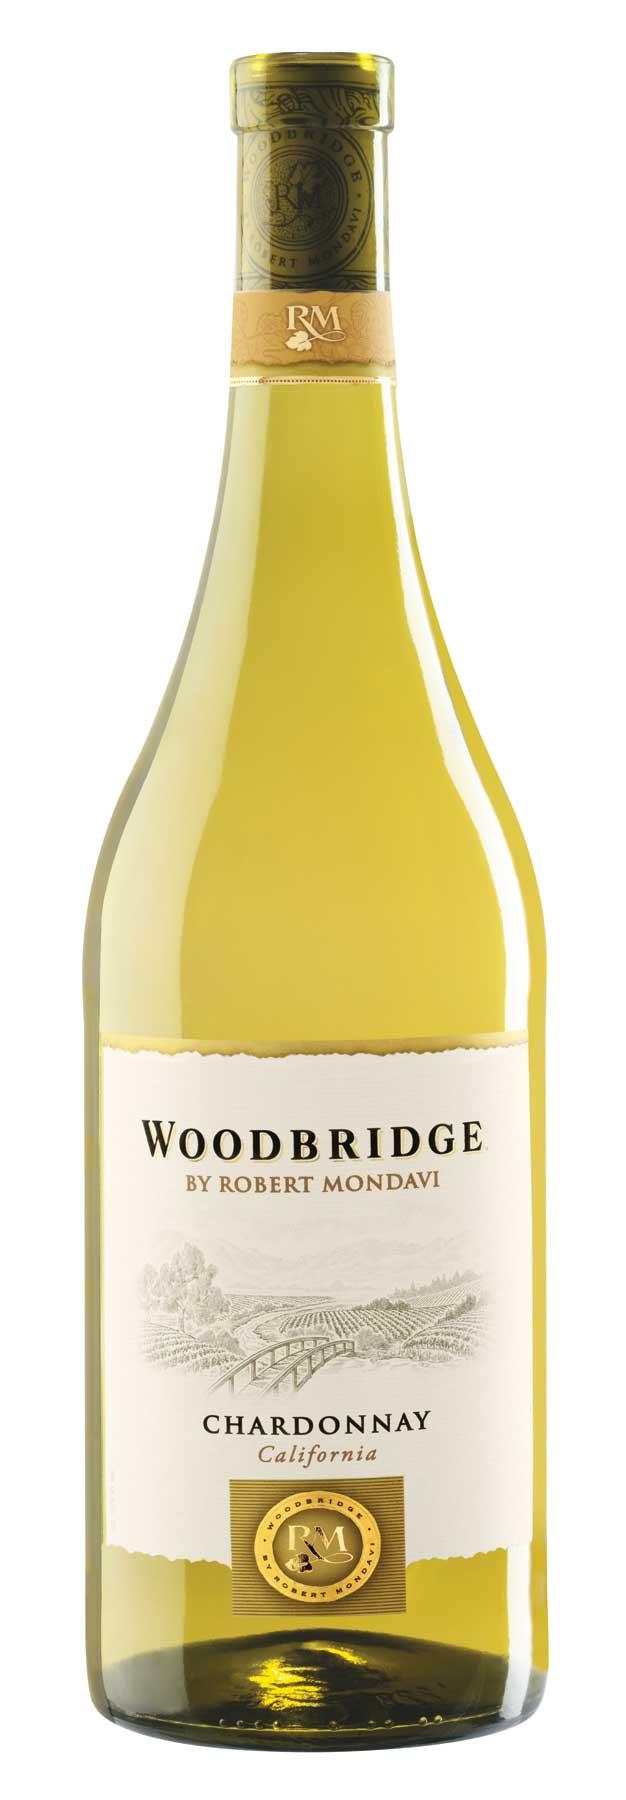 Robert Mondavi Winery Woodbridge Chardonnay 2007 Expert Wine Review: Natalie MacLean